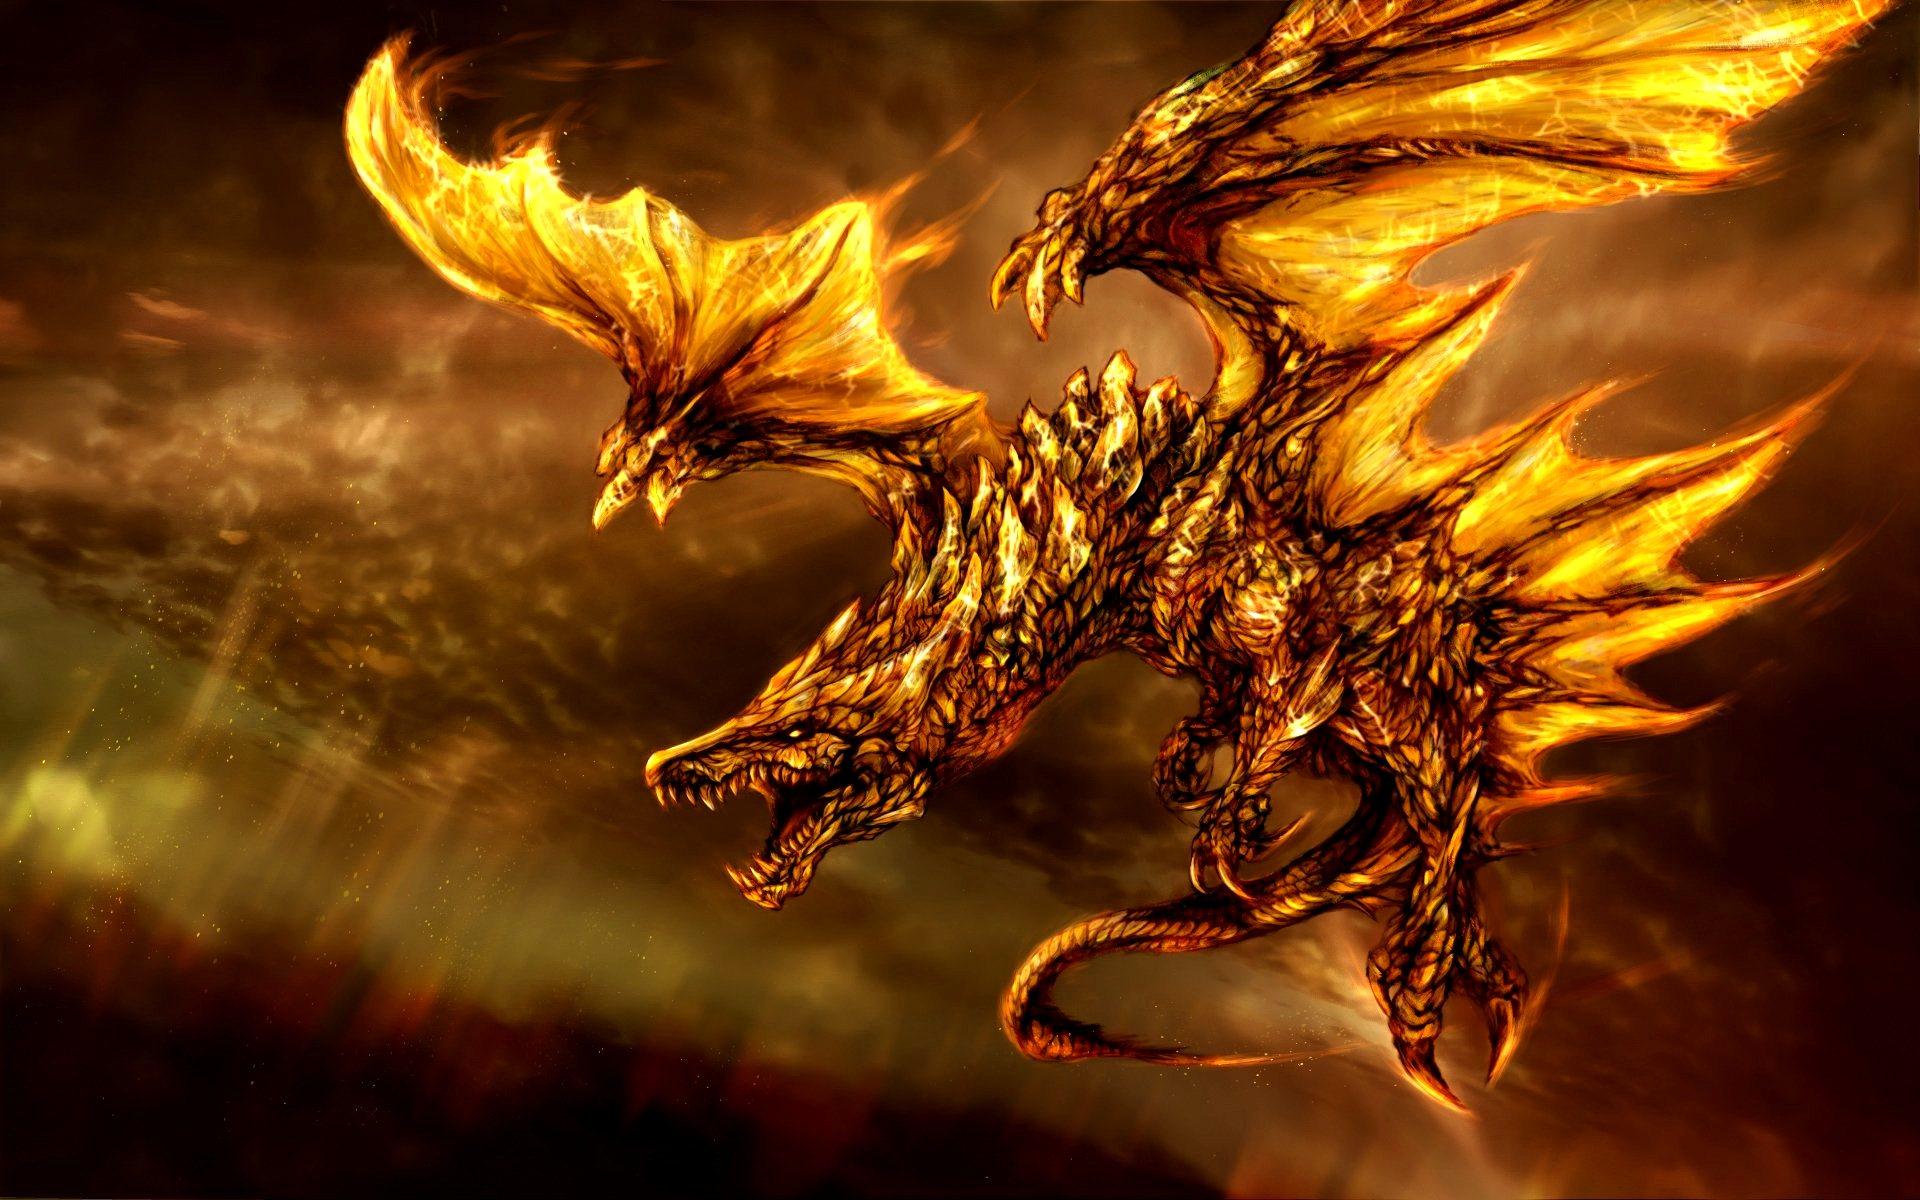 Gold Skin Chinese Dragon Wallpapers 3D Desktop WIdescreen 1920x1200